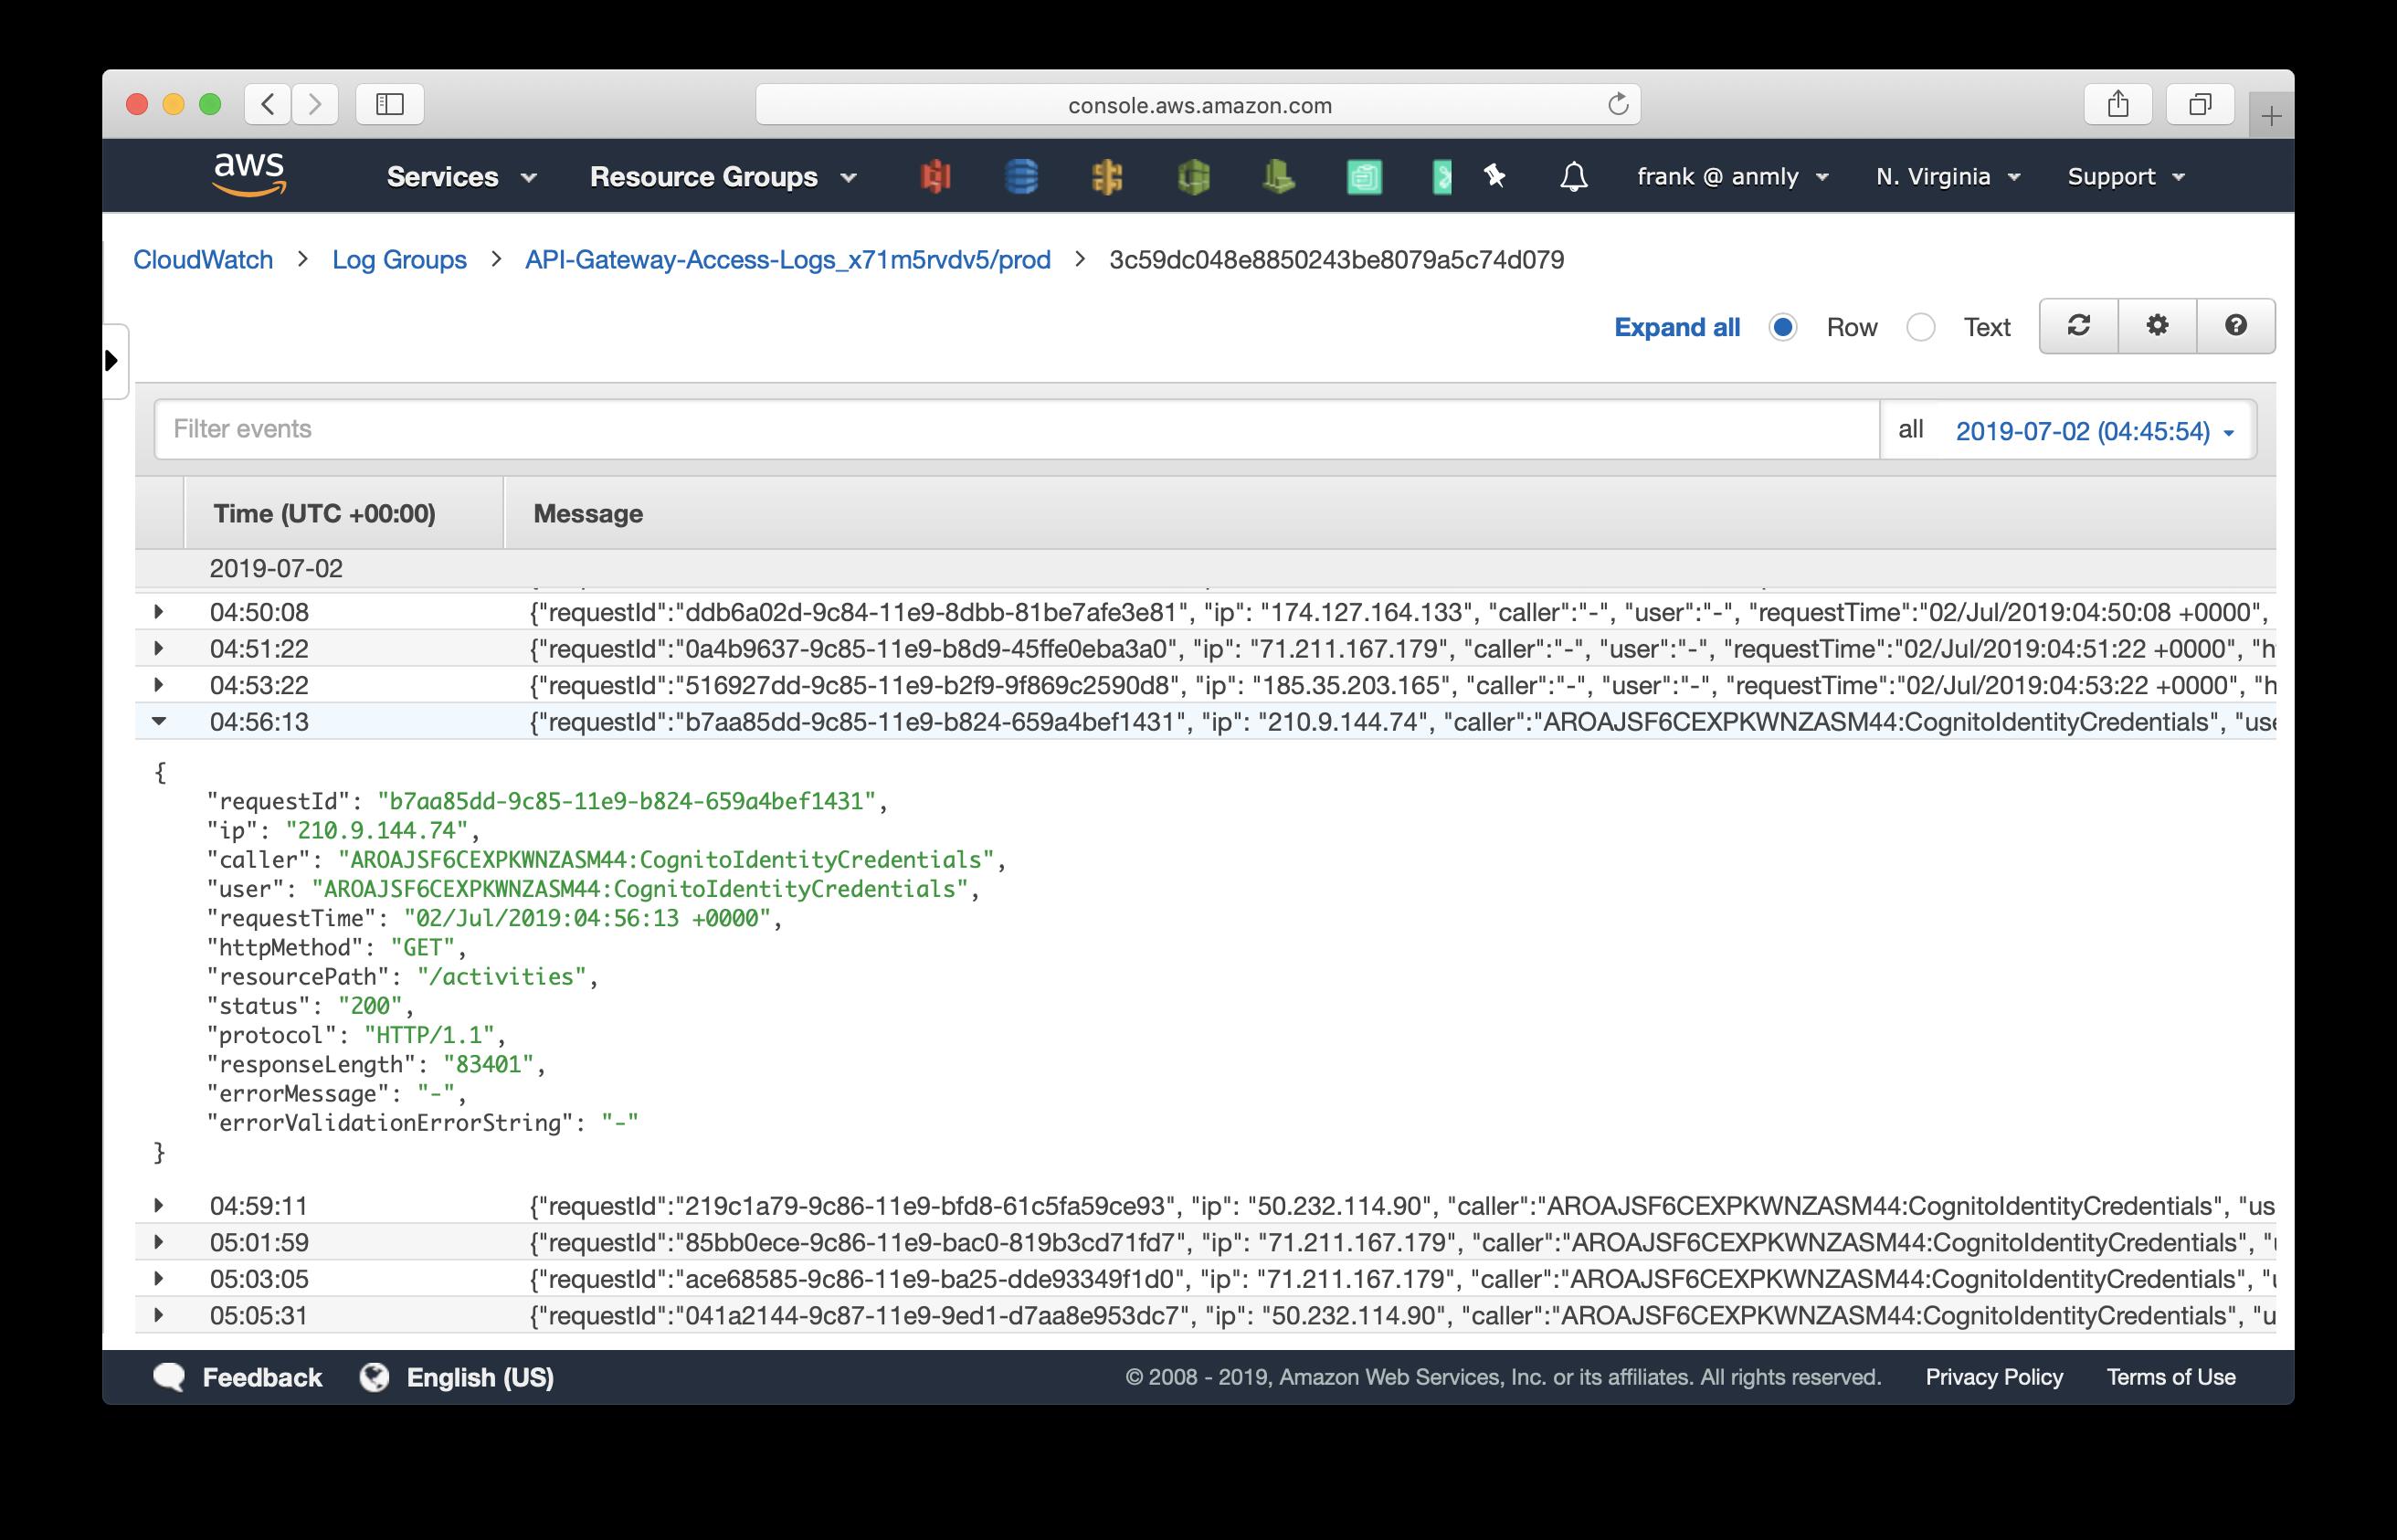 CloudWatch API Gateway Access Logs details